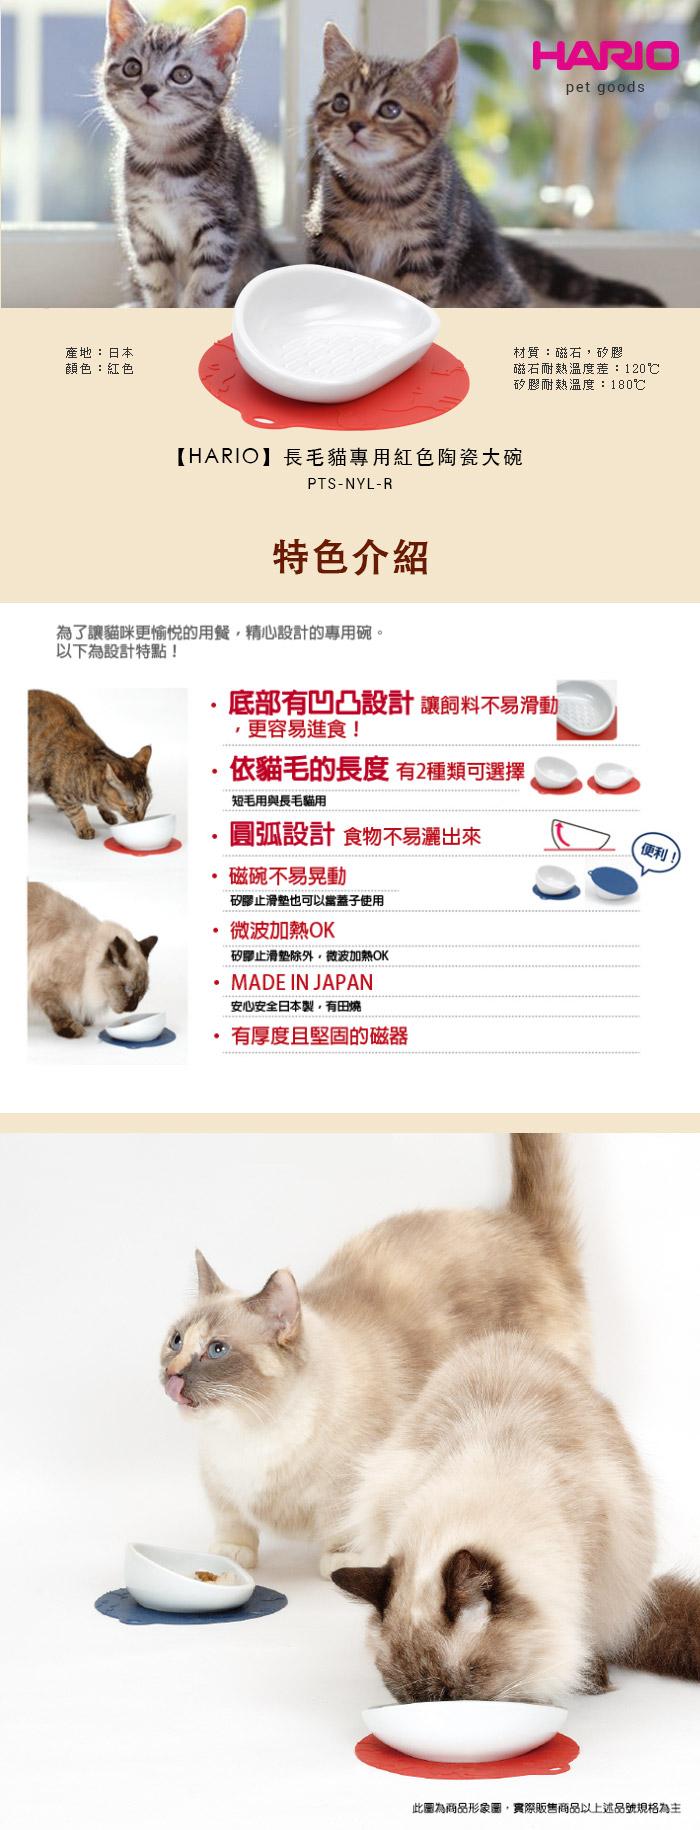 HARIO  長毛貓專用藍色陶瓷大碗  PTS-NYL-DBU